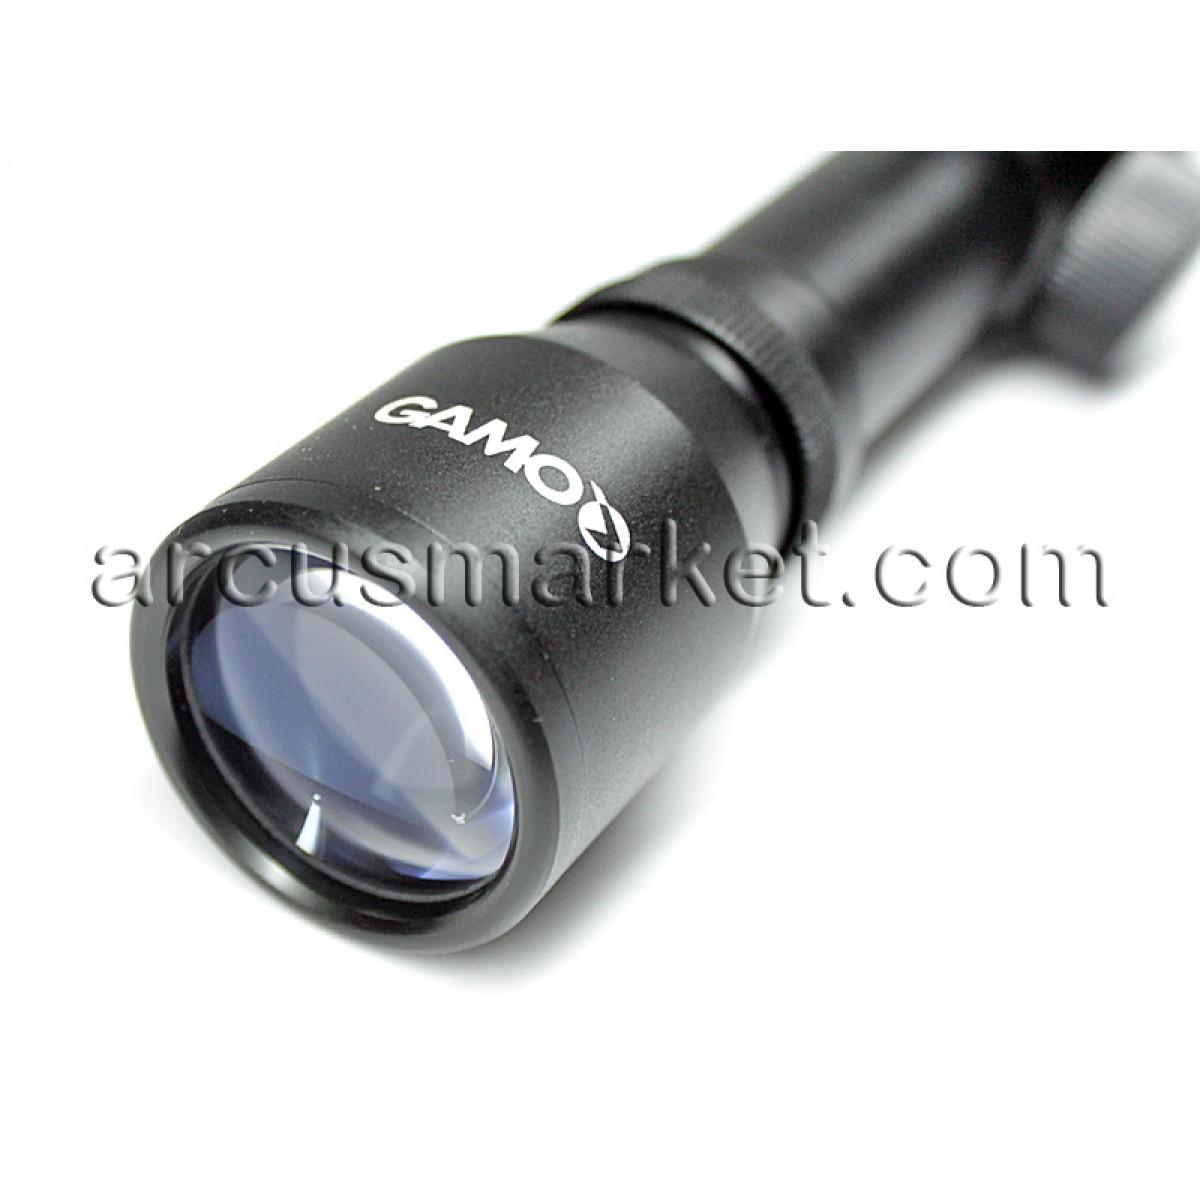 Прицел оптический Tasco 4x32